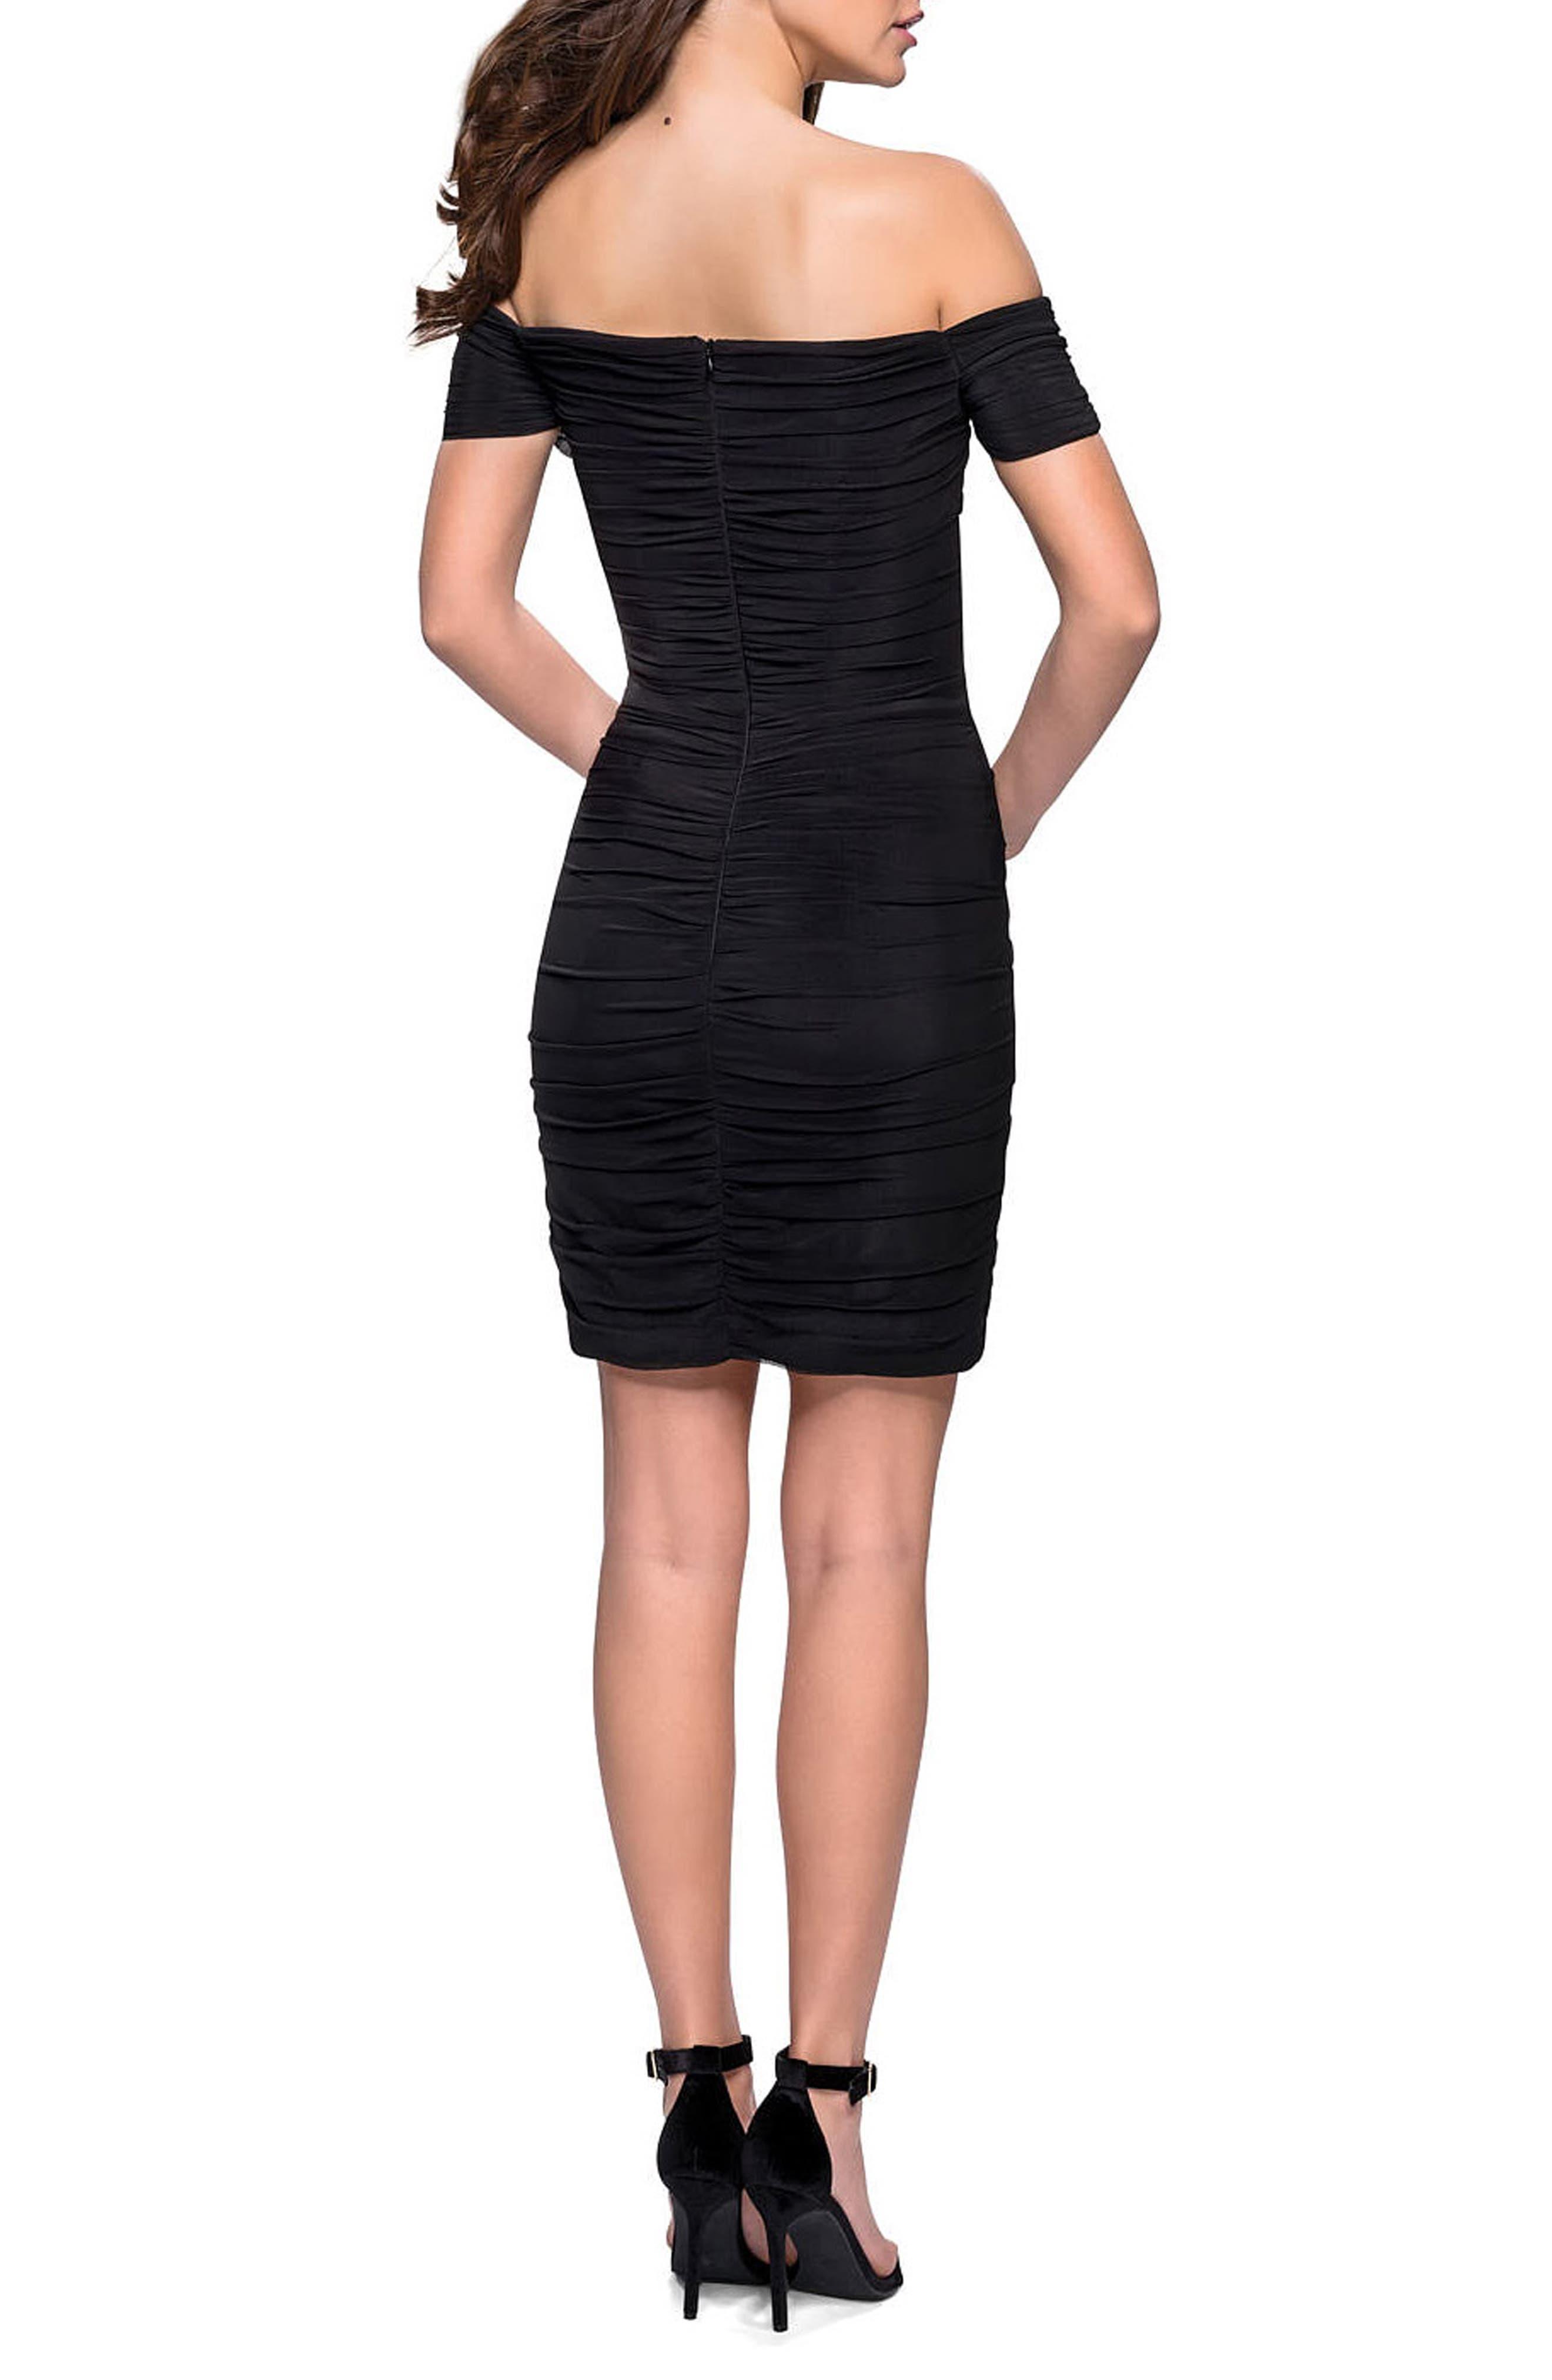 LA FEMME, Off the Shoulder Ruched Party Dress, Alternate thumbnail 2, color, BLACK